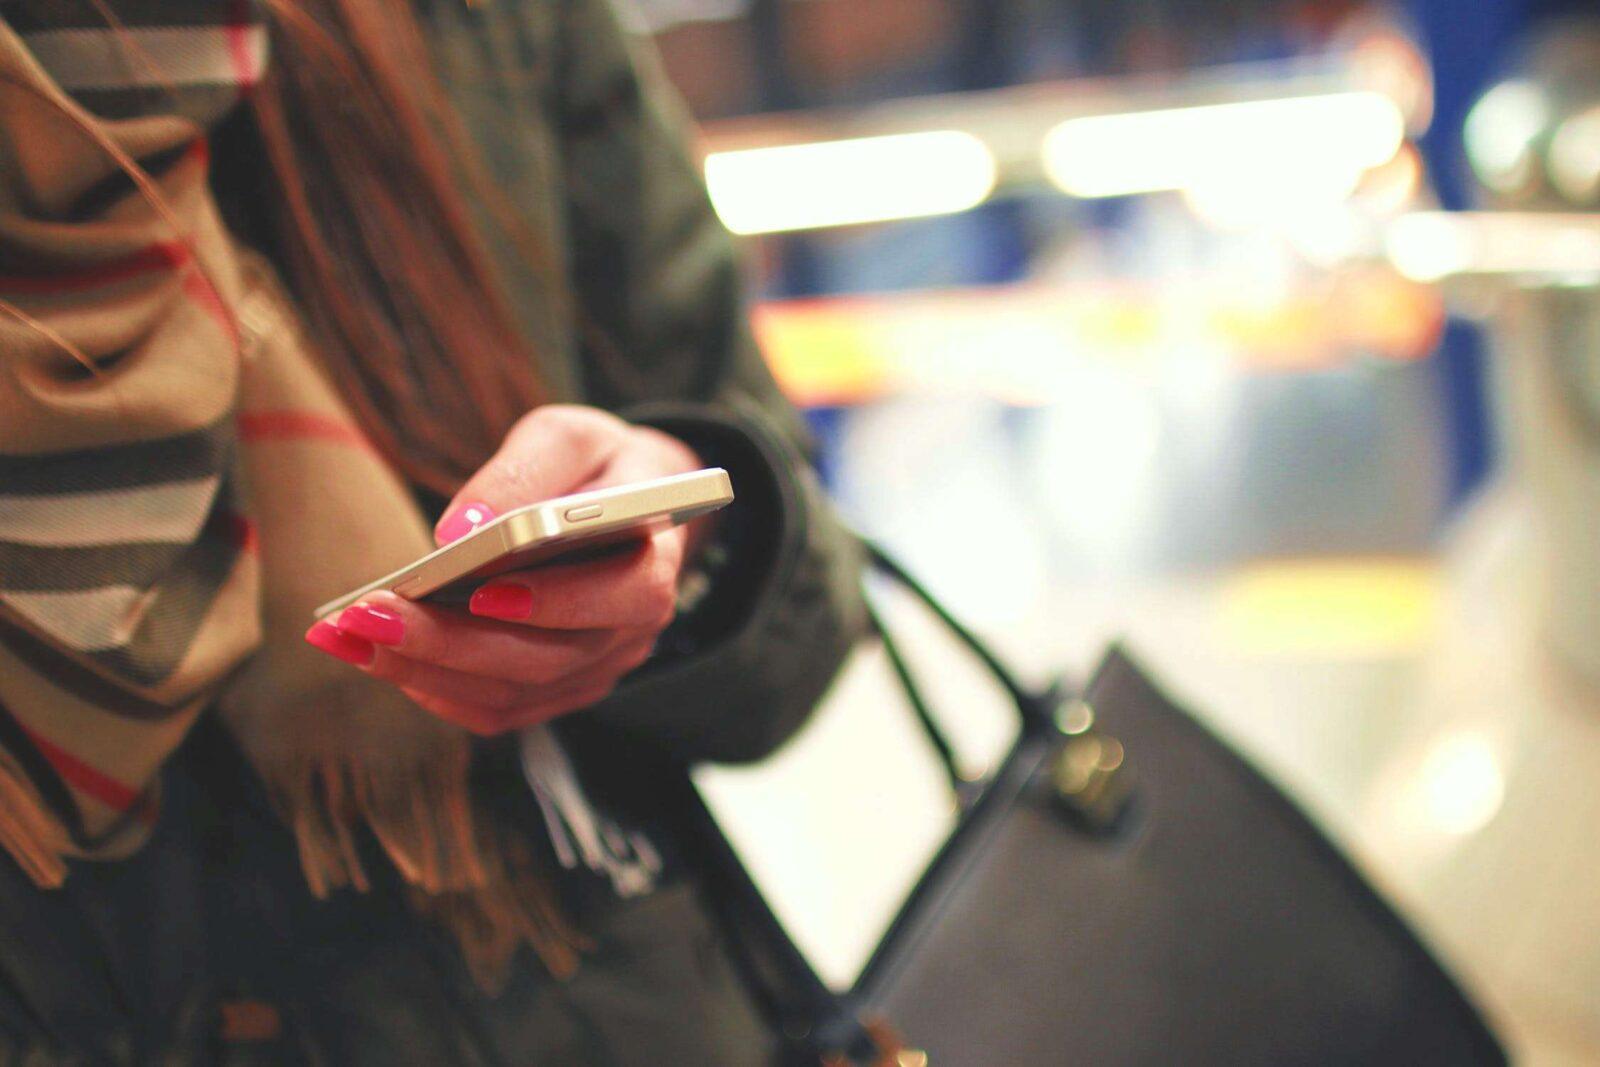 kobieta komórka manicure paznokcie różowe tipsy torba komunikacja miejska